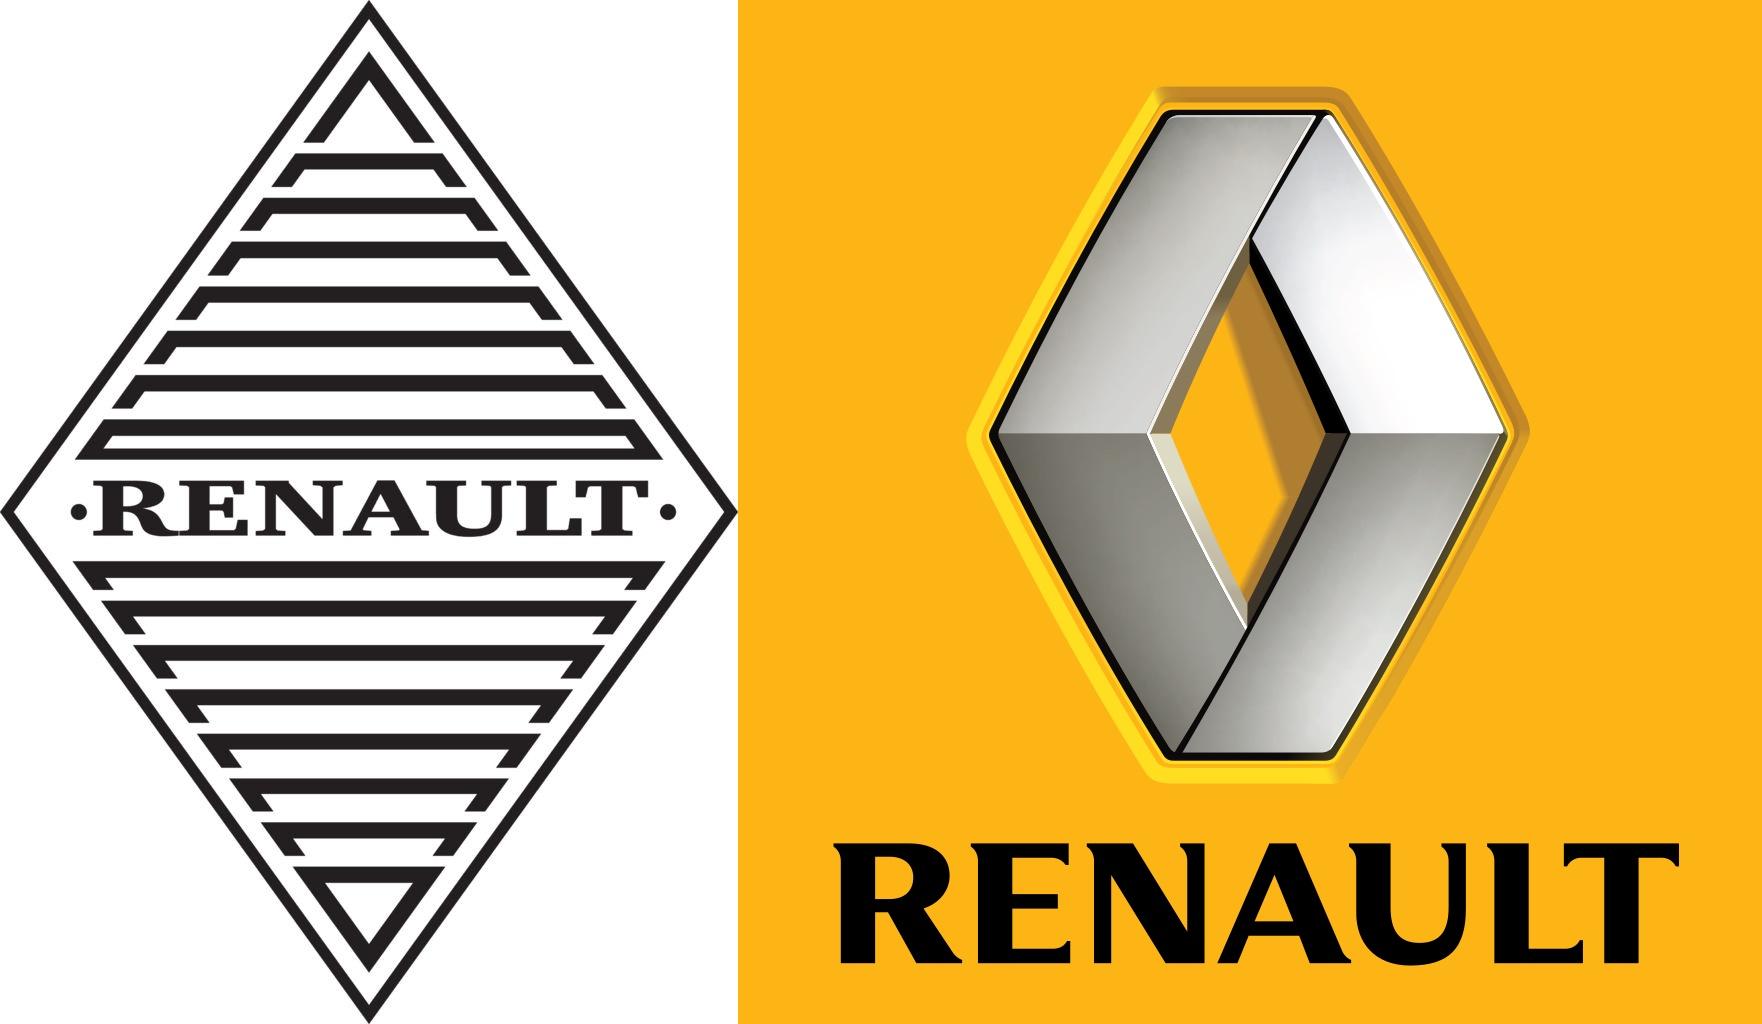 Transportation Company - Renault - Automobiles